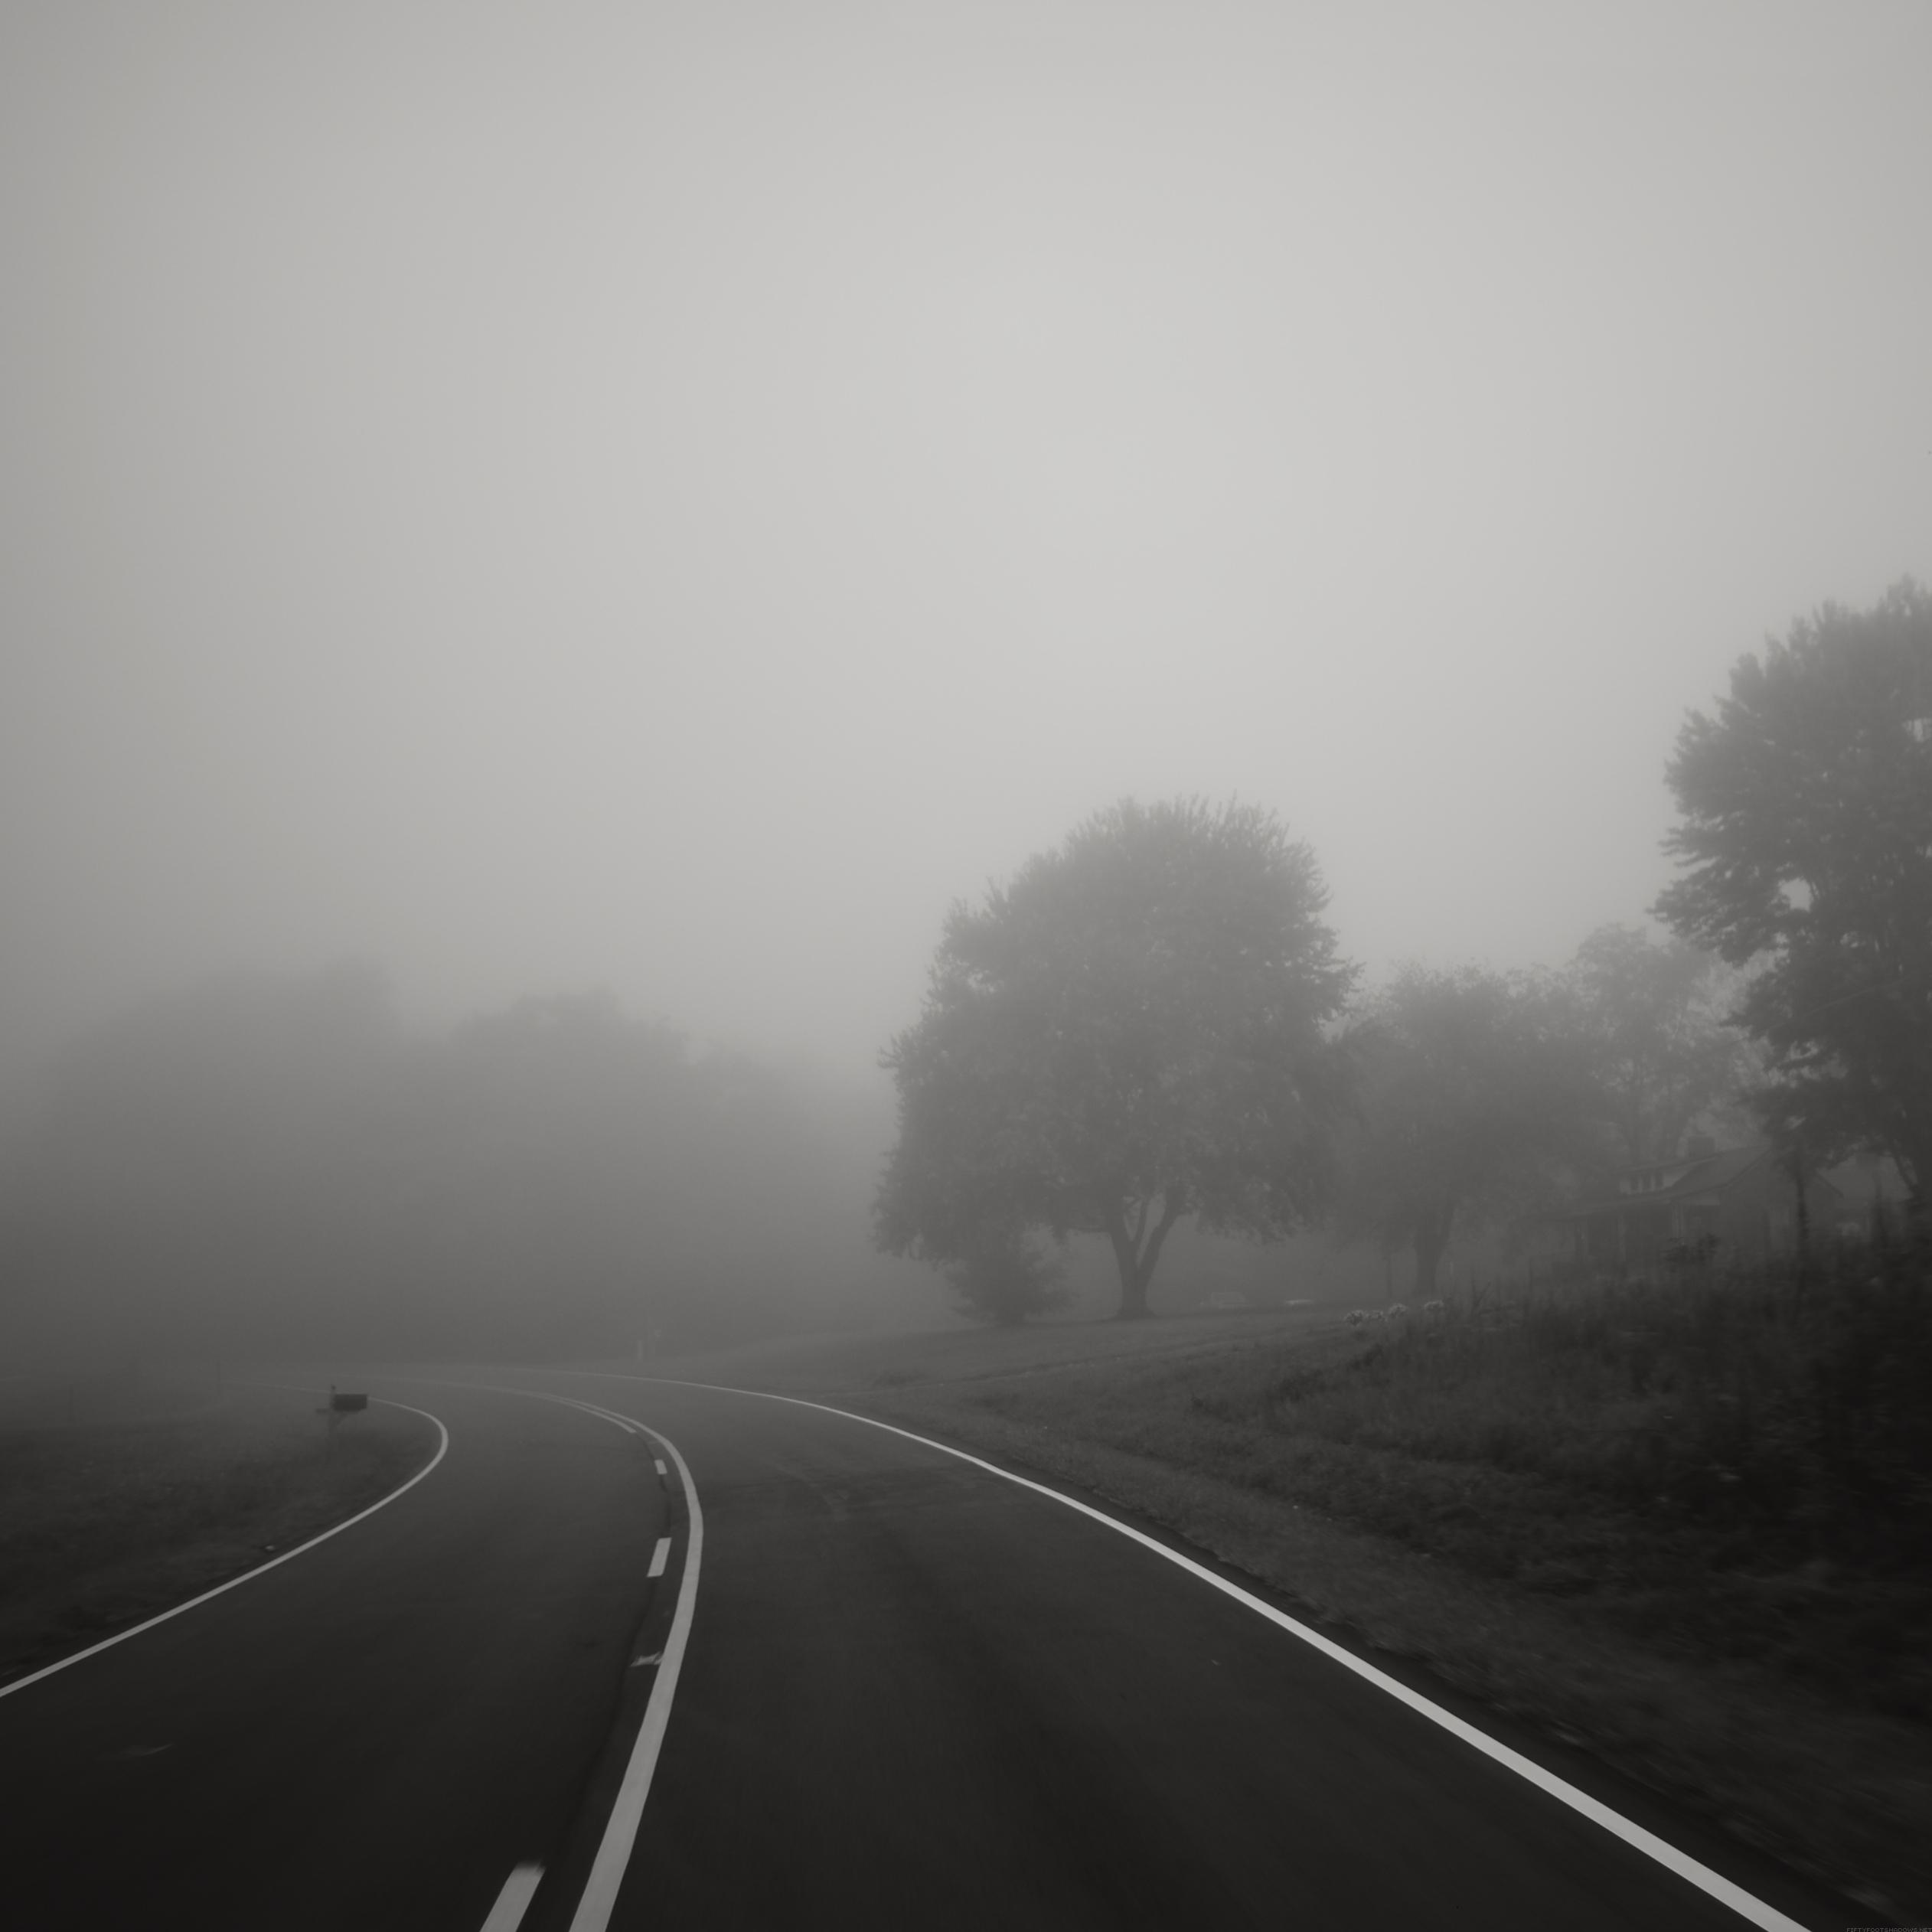 Mist clipart black and white #11